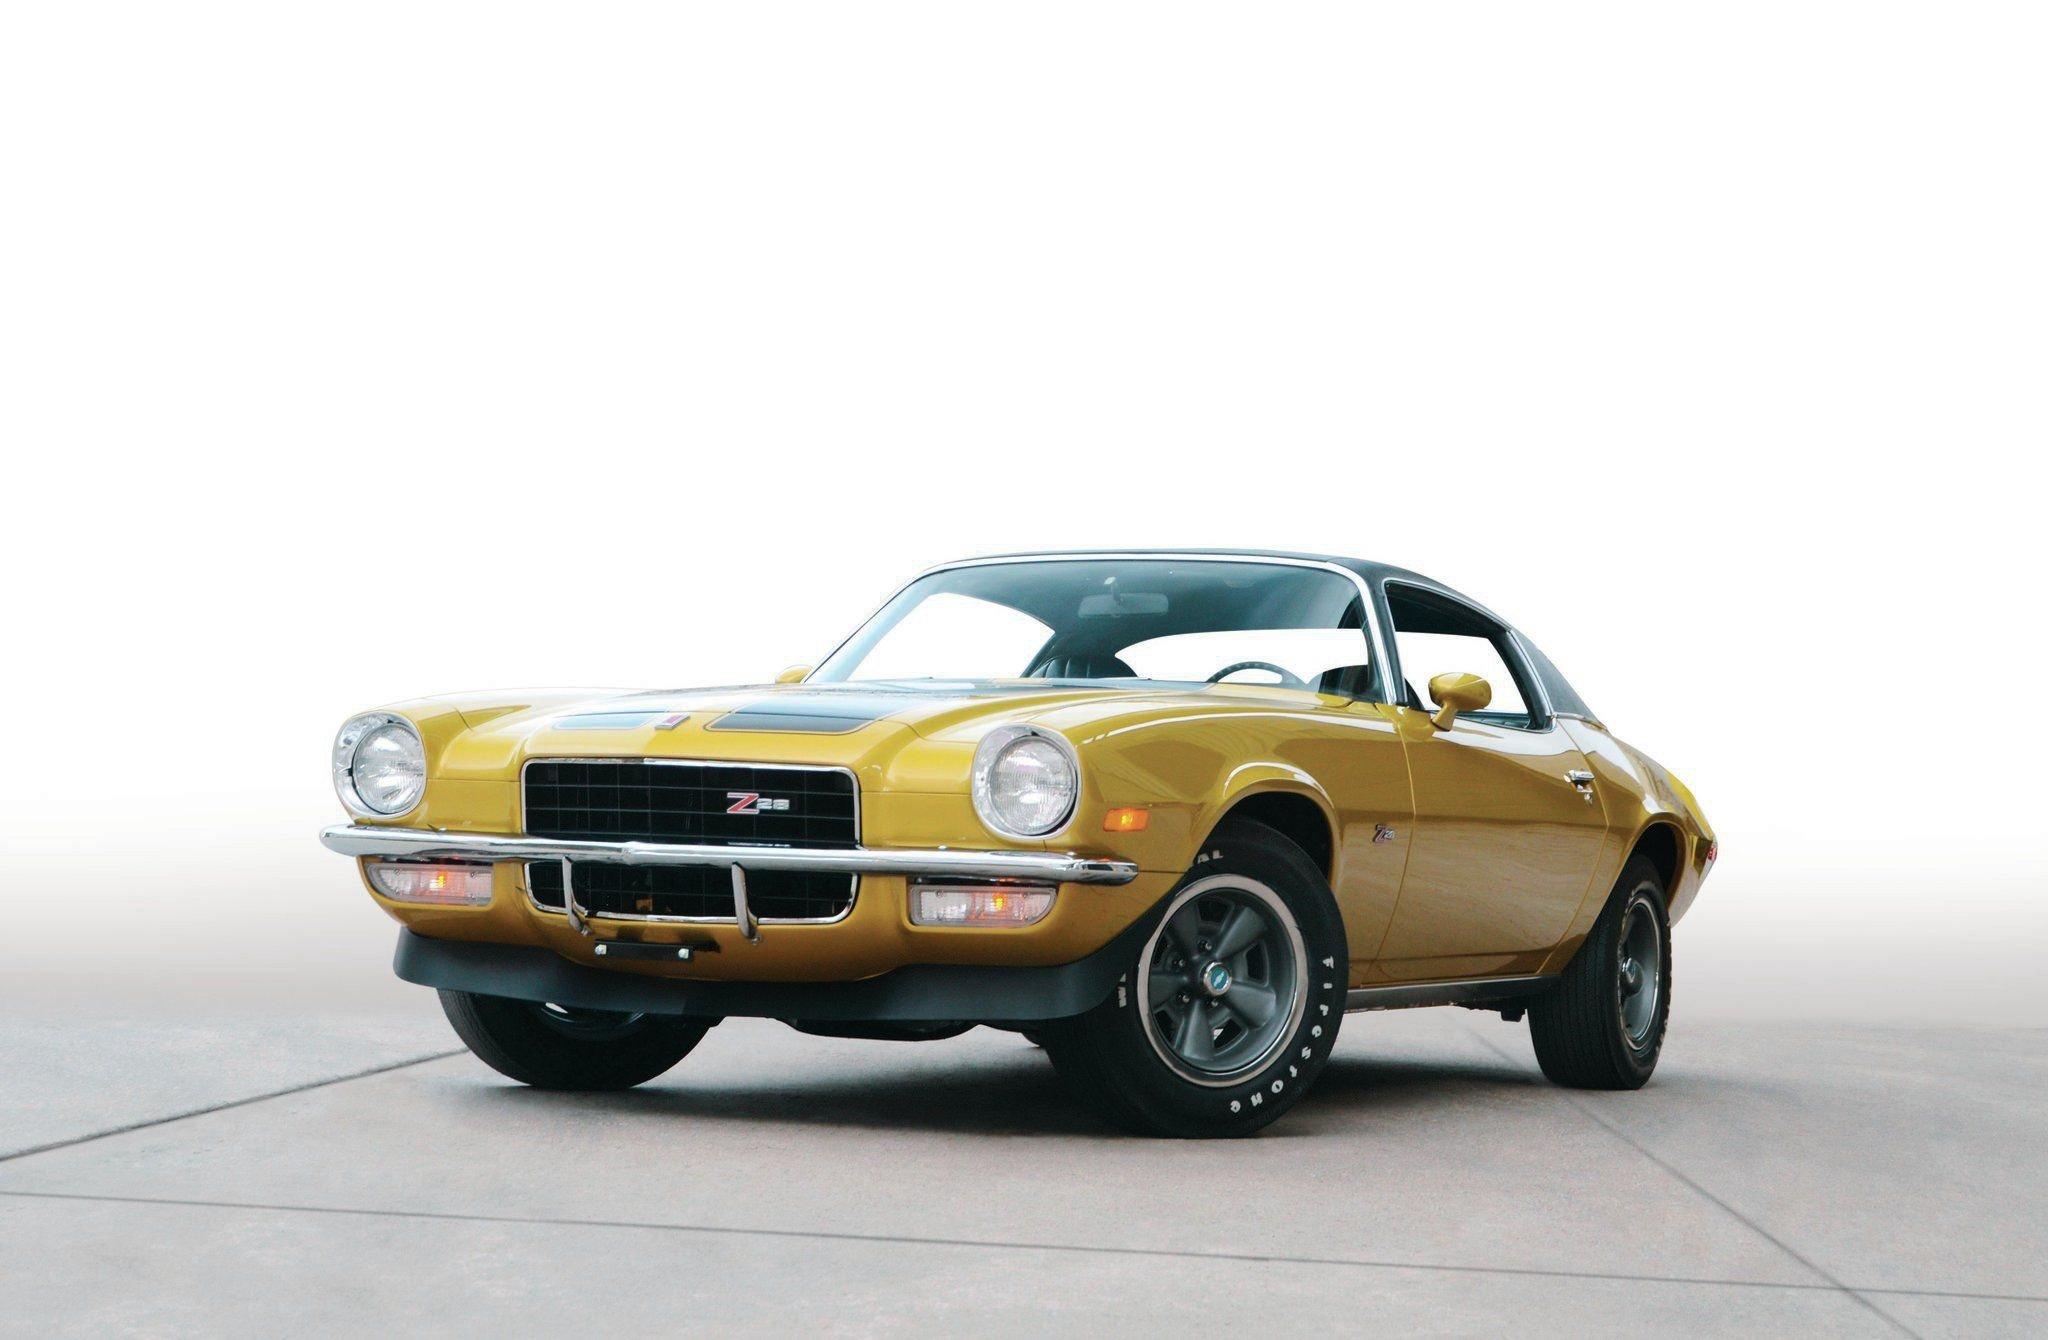 1972 Chevrolet Camato LT-01 wallpaper